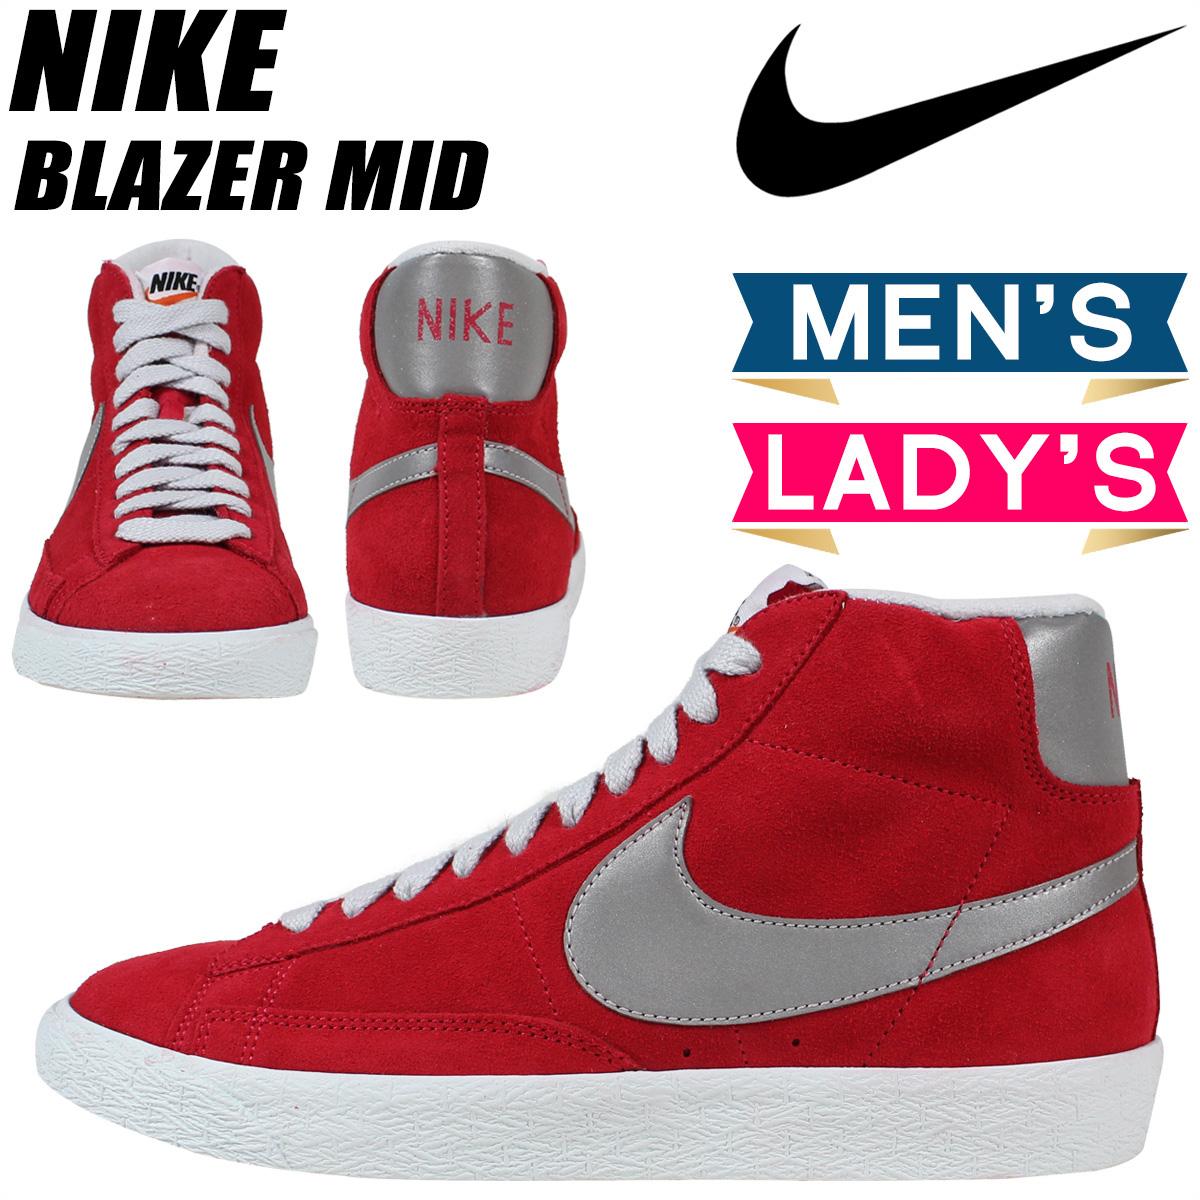 Nike blazer mid prm vintage suede